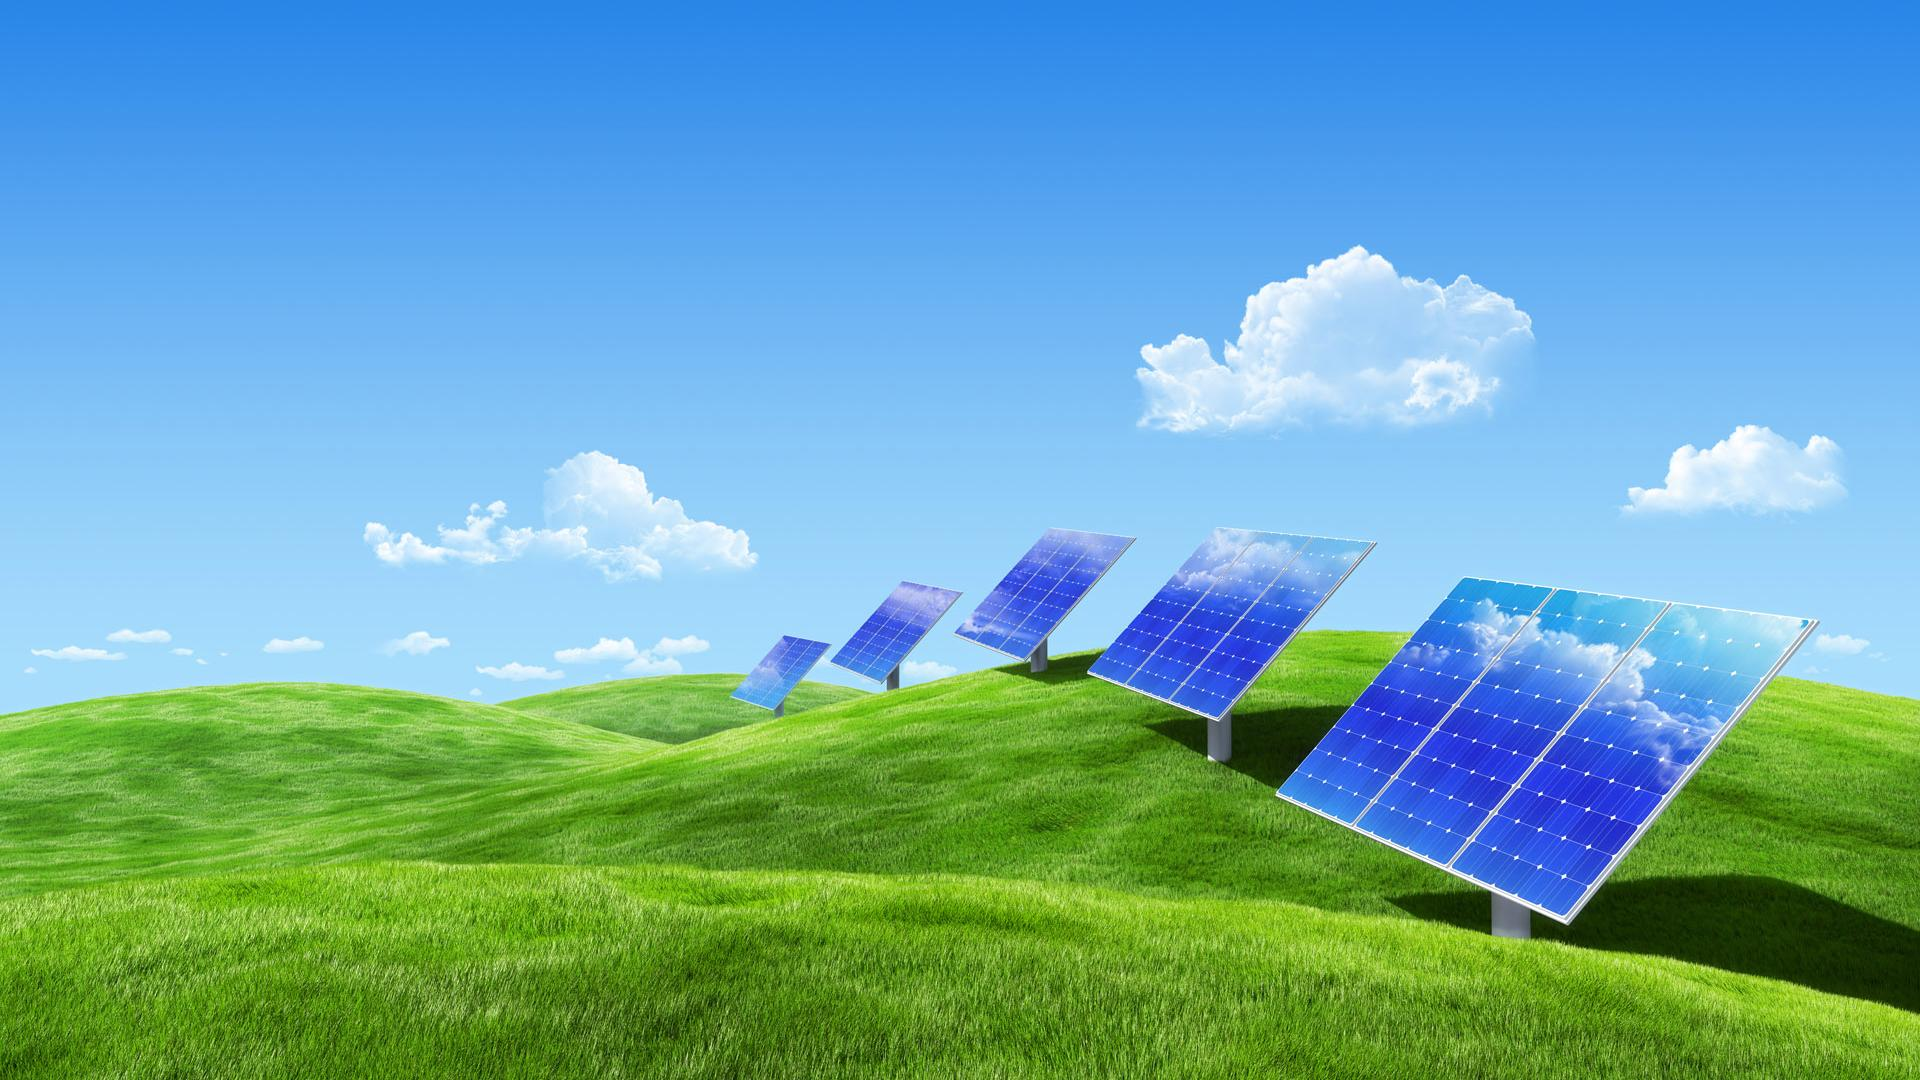 Free Solar Systems In Victoria | AllGreen Australia  | free solar systems in Victoria, Adelaide, Melbourne, Geelong, Ballarat, Bendigo, Mildura, Swan Hill, Echuca, Shepperton, Horsham, Wangaratta, Wodonga, - GL52781